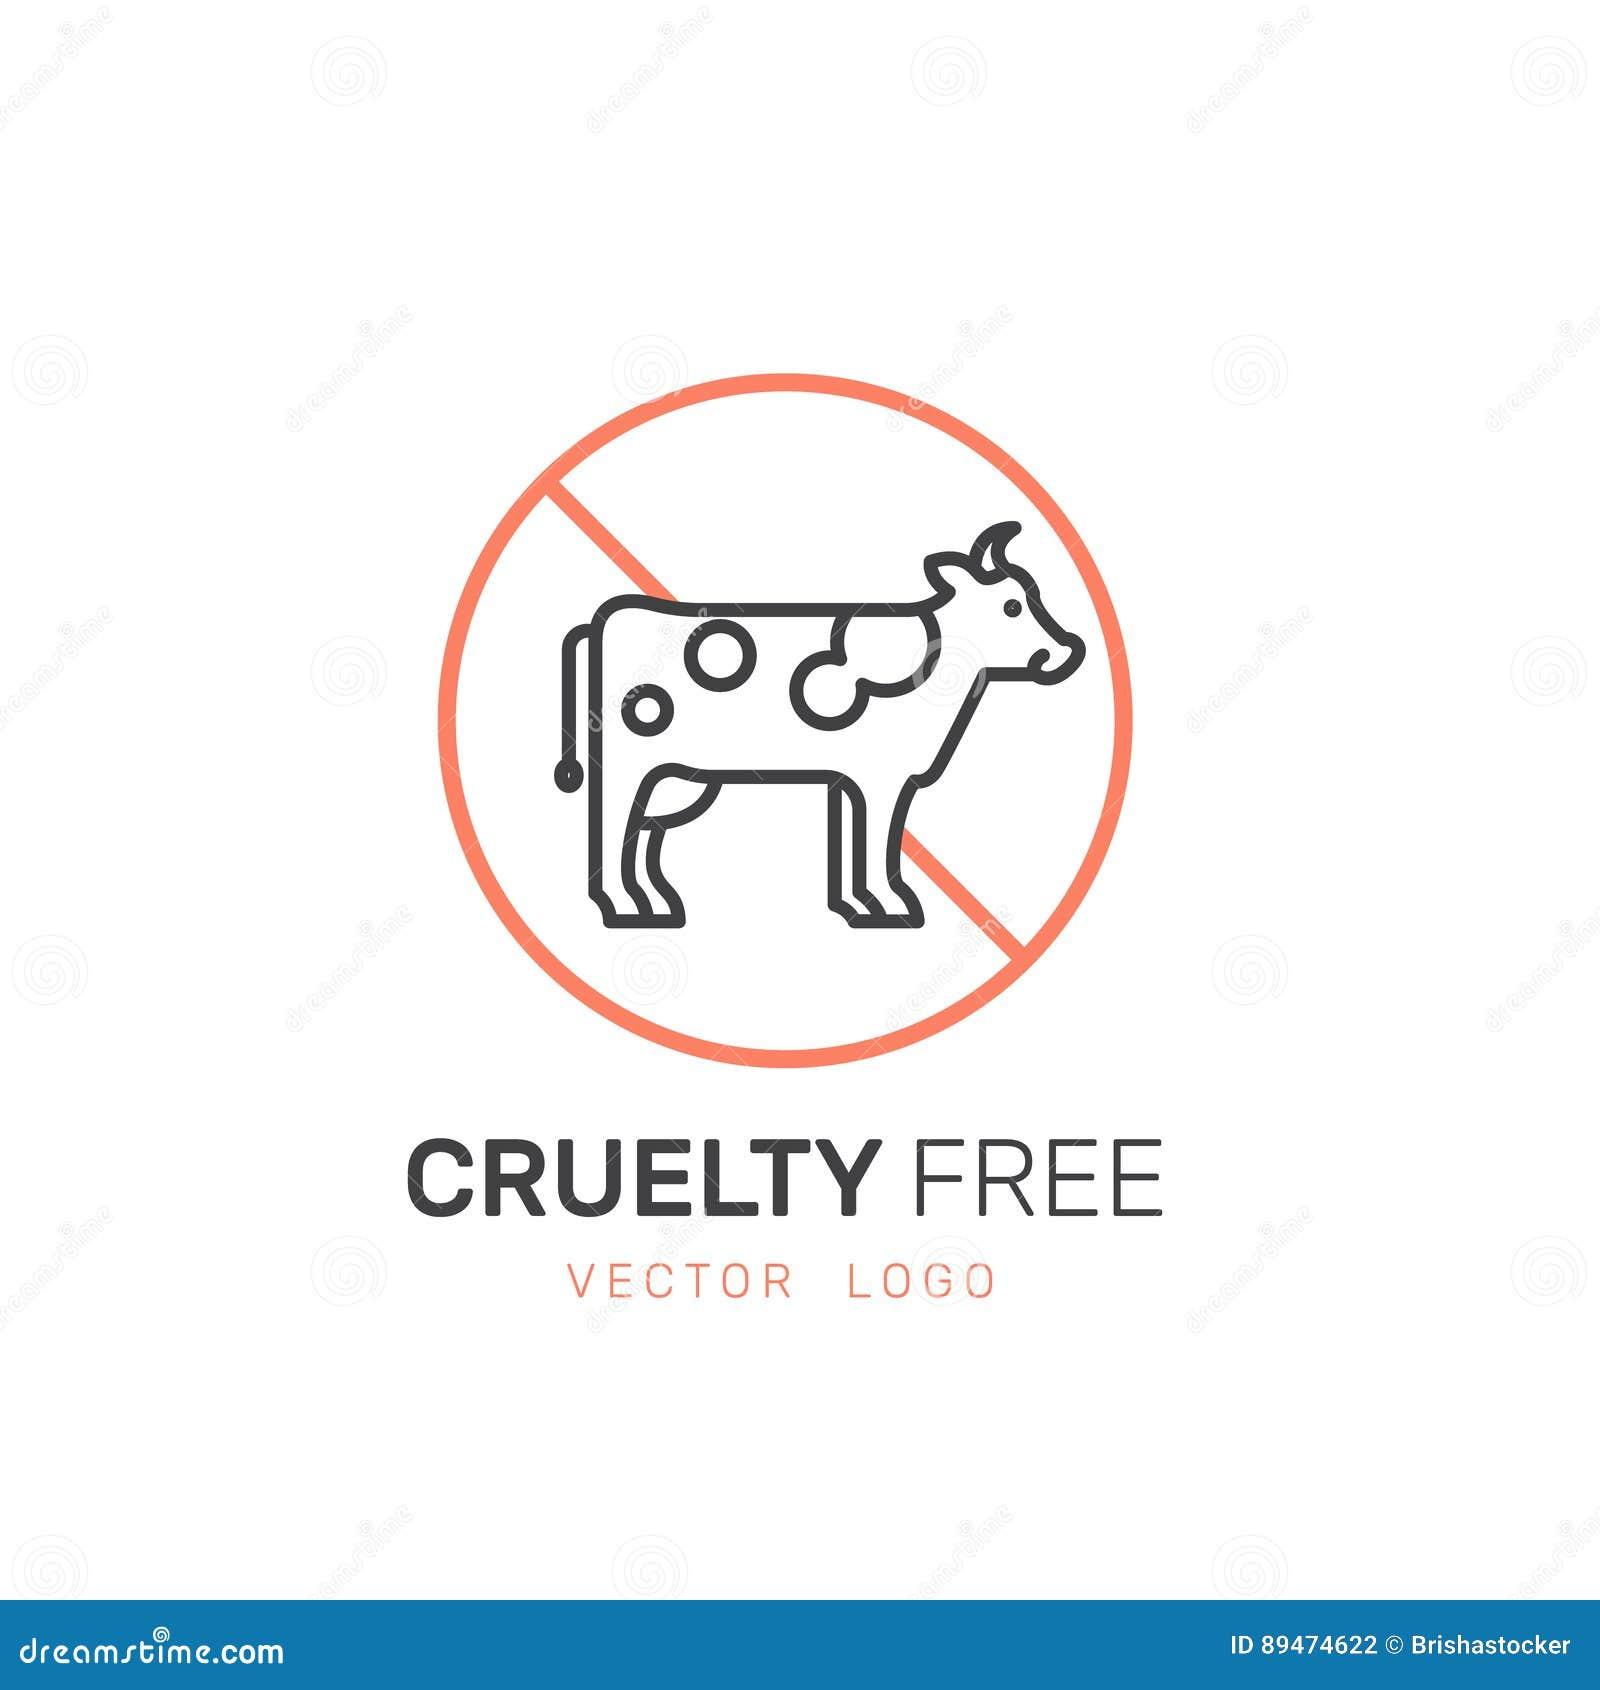 Ingredient Warning Label Icon Cruelty Free Vegan And Vegetarian